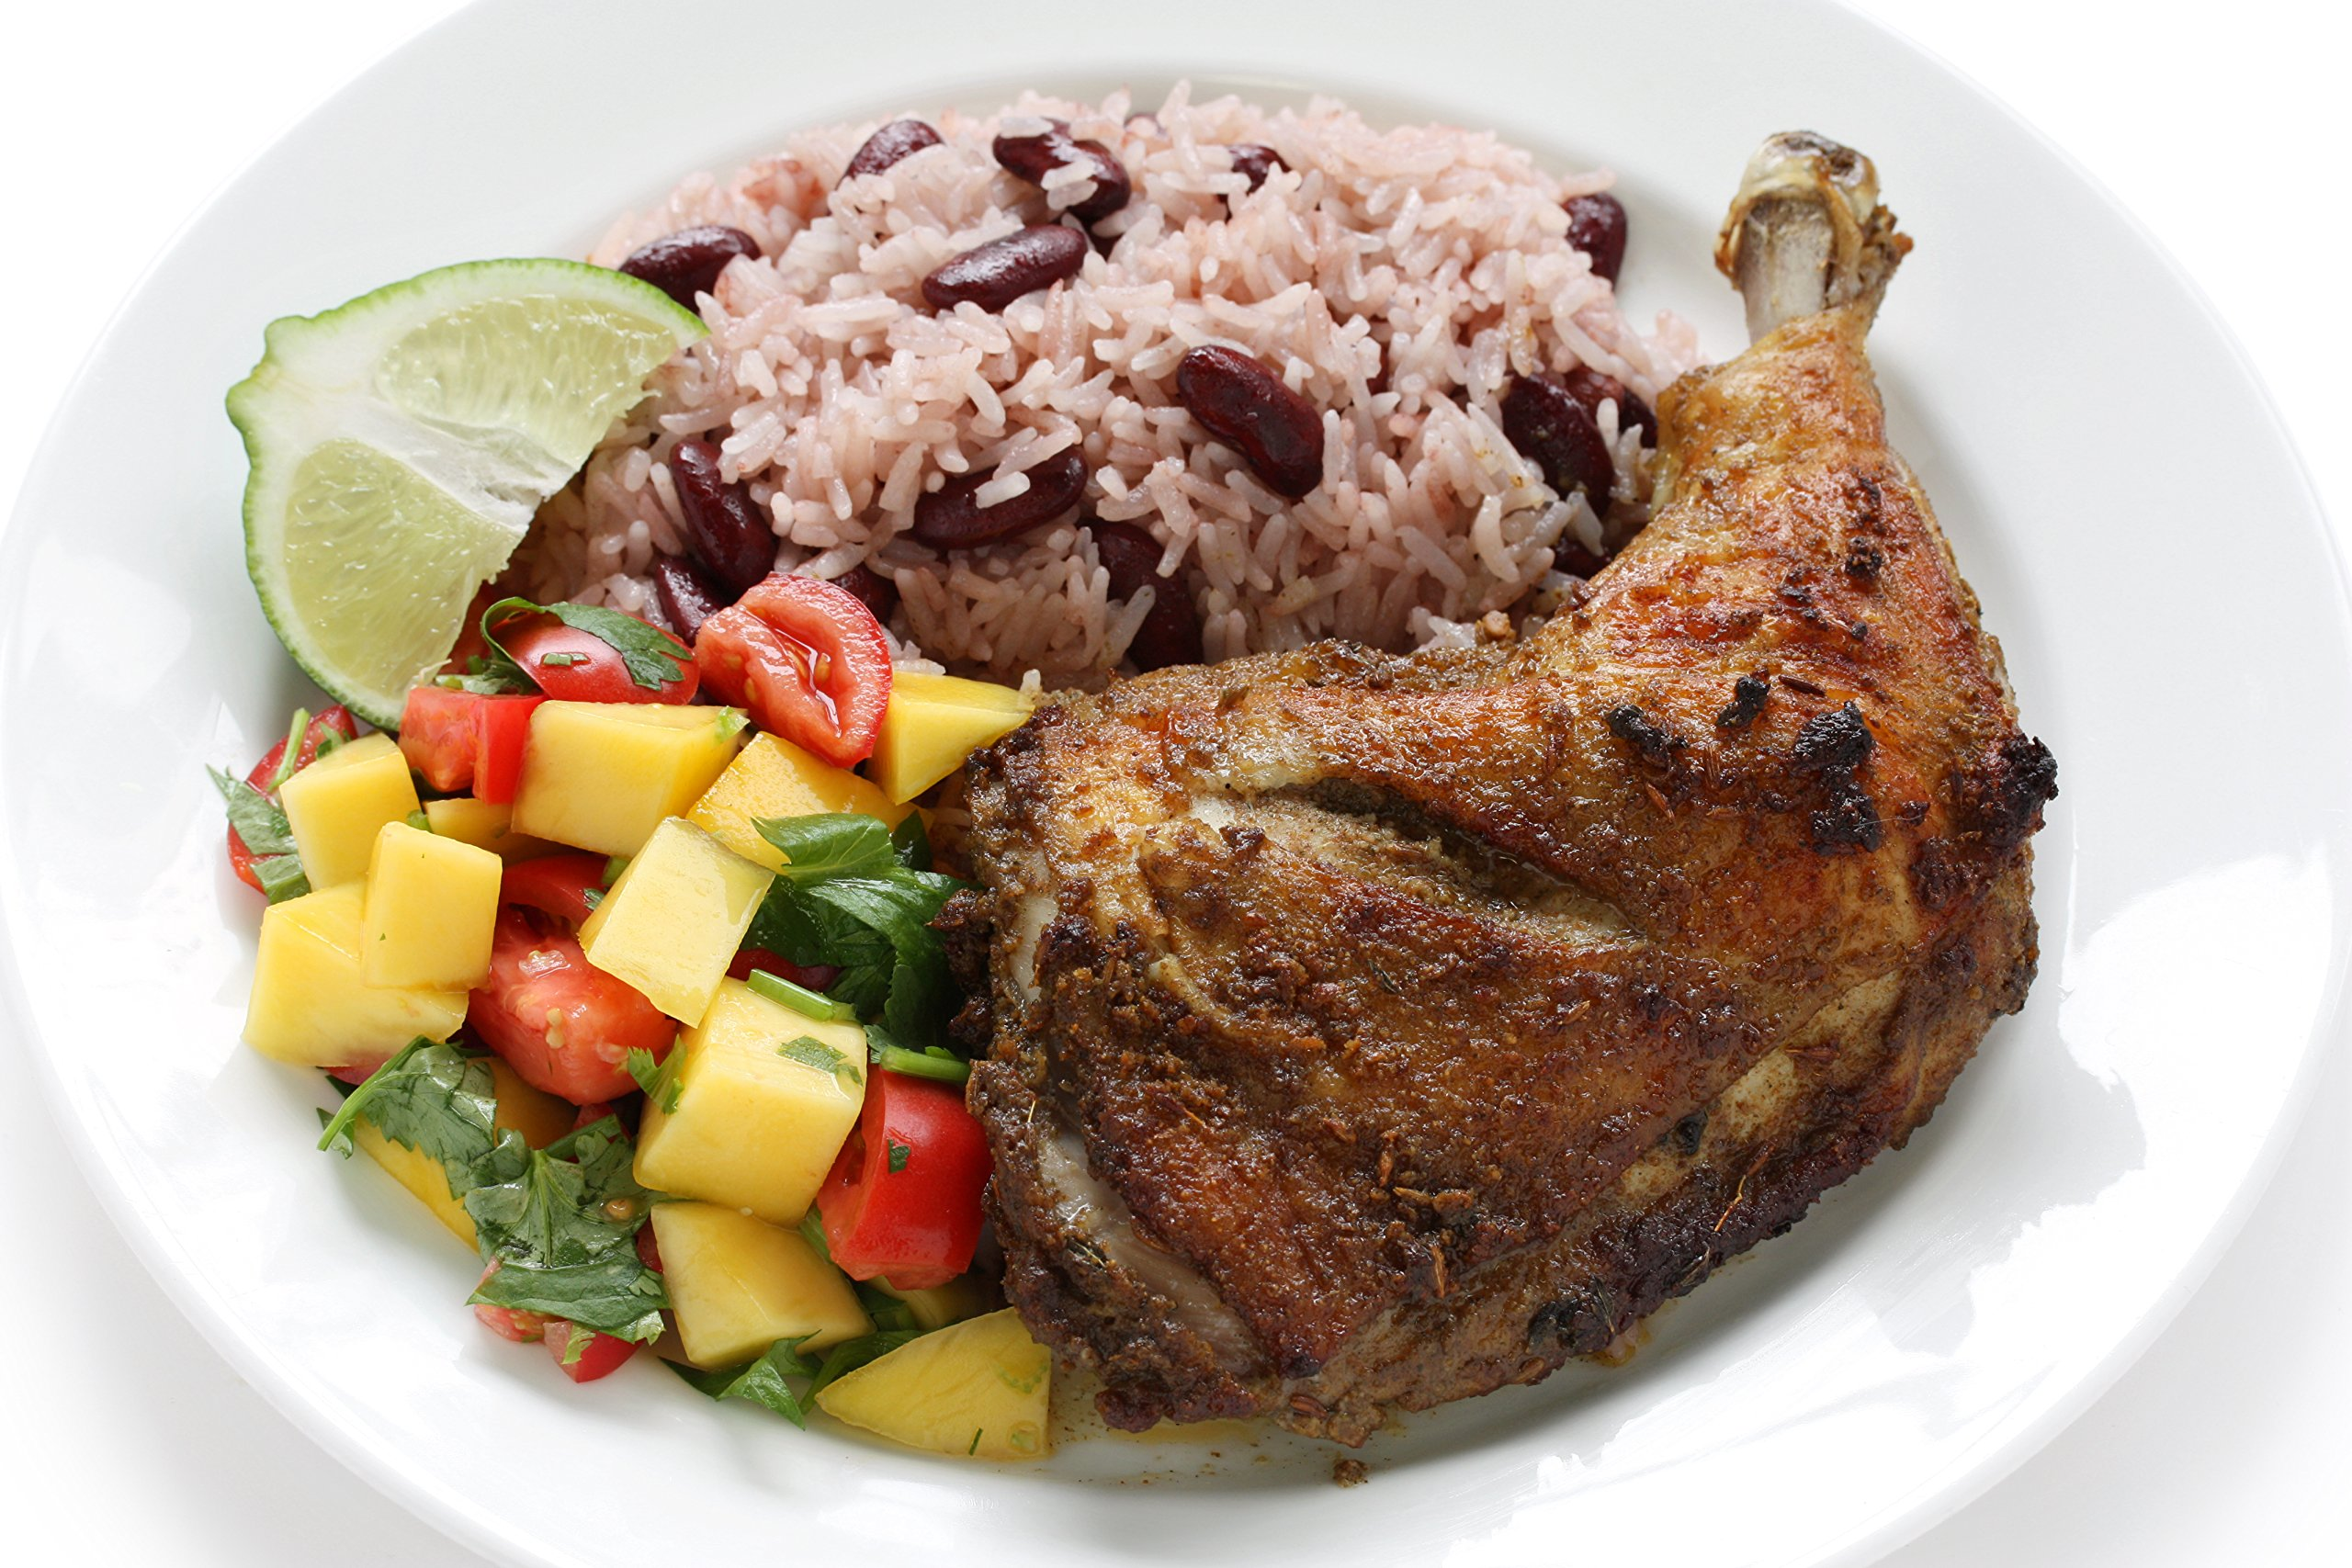 Grace Jerk Seasoning - Mild - 12 Pack x 10 oz - Authentic Jamaican Jerk Sauce - Great Jerk Marinade for Jerk Chicken, Pork, Fish, Vegetables, Tofu and More - Bonus Jerk Cooking Recipe Book by Grace (Image #3)